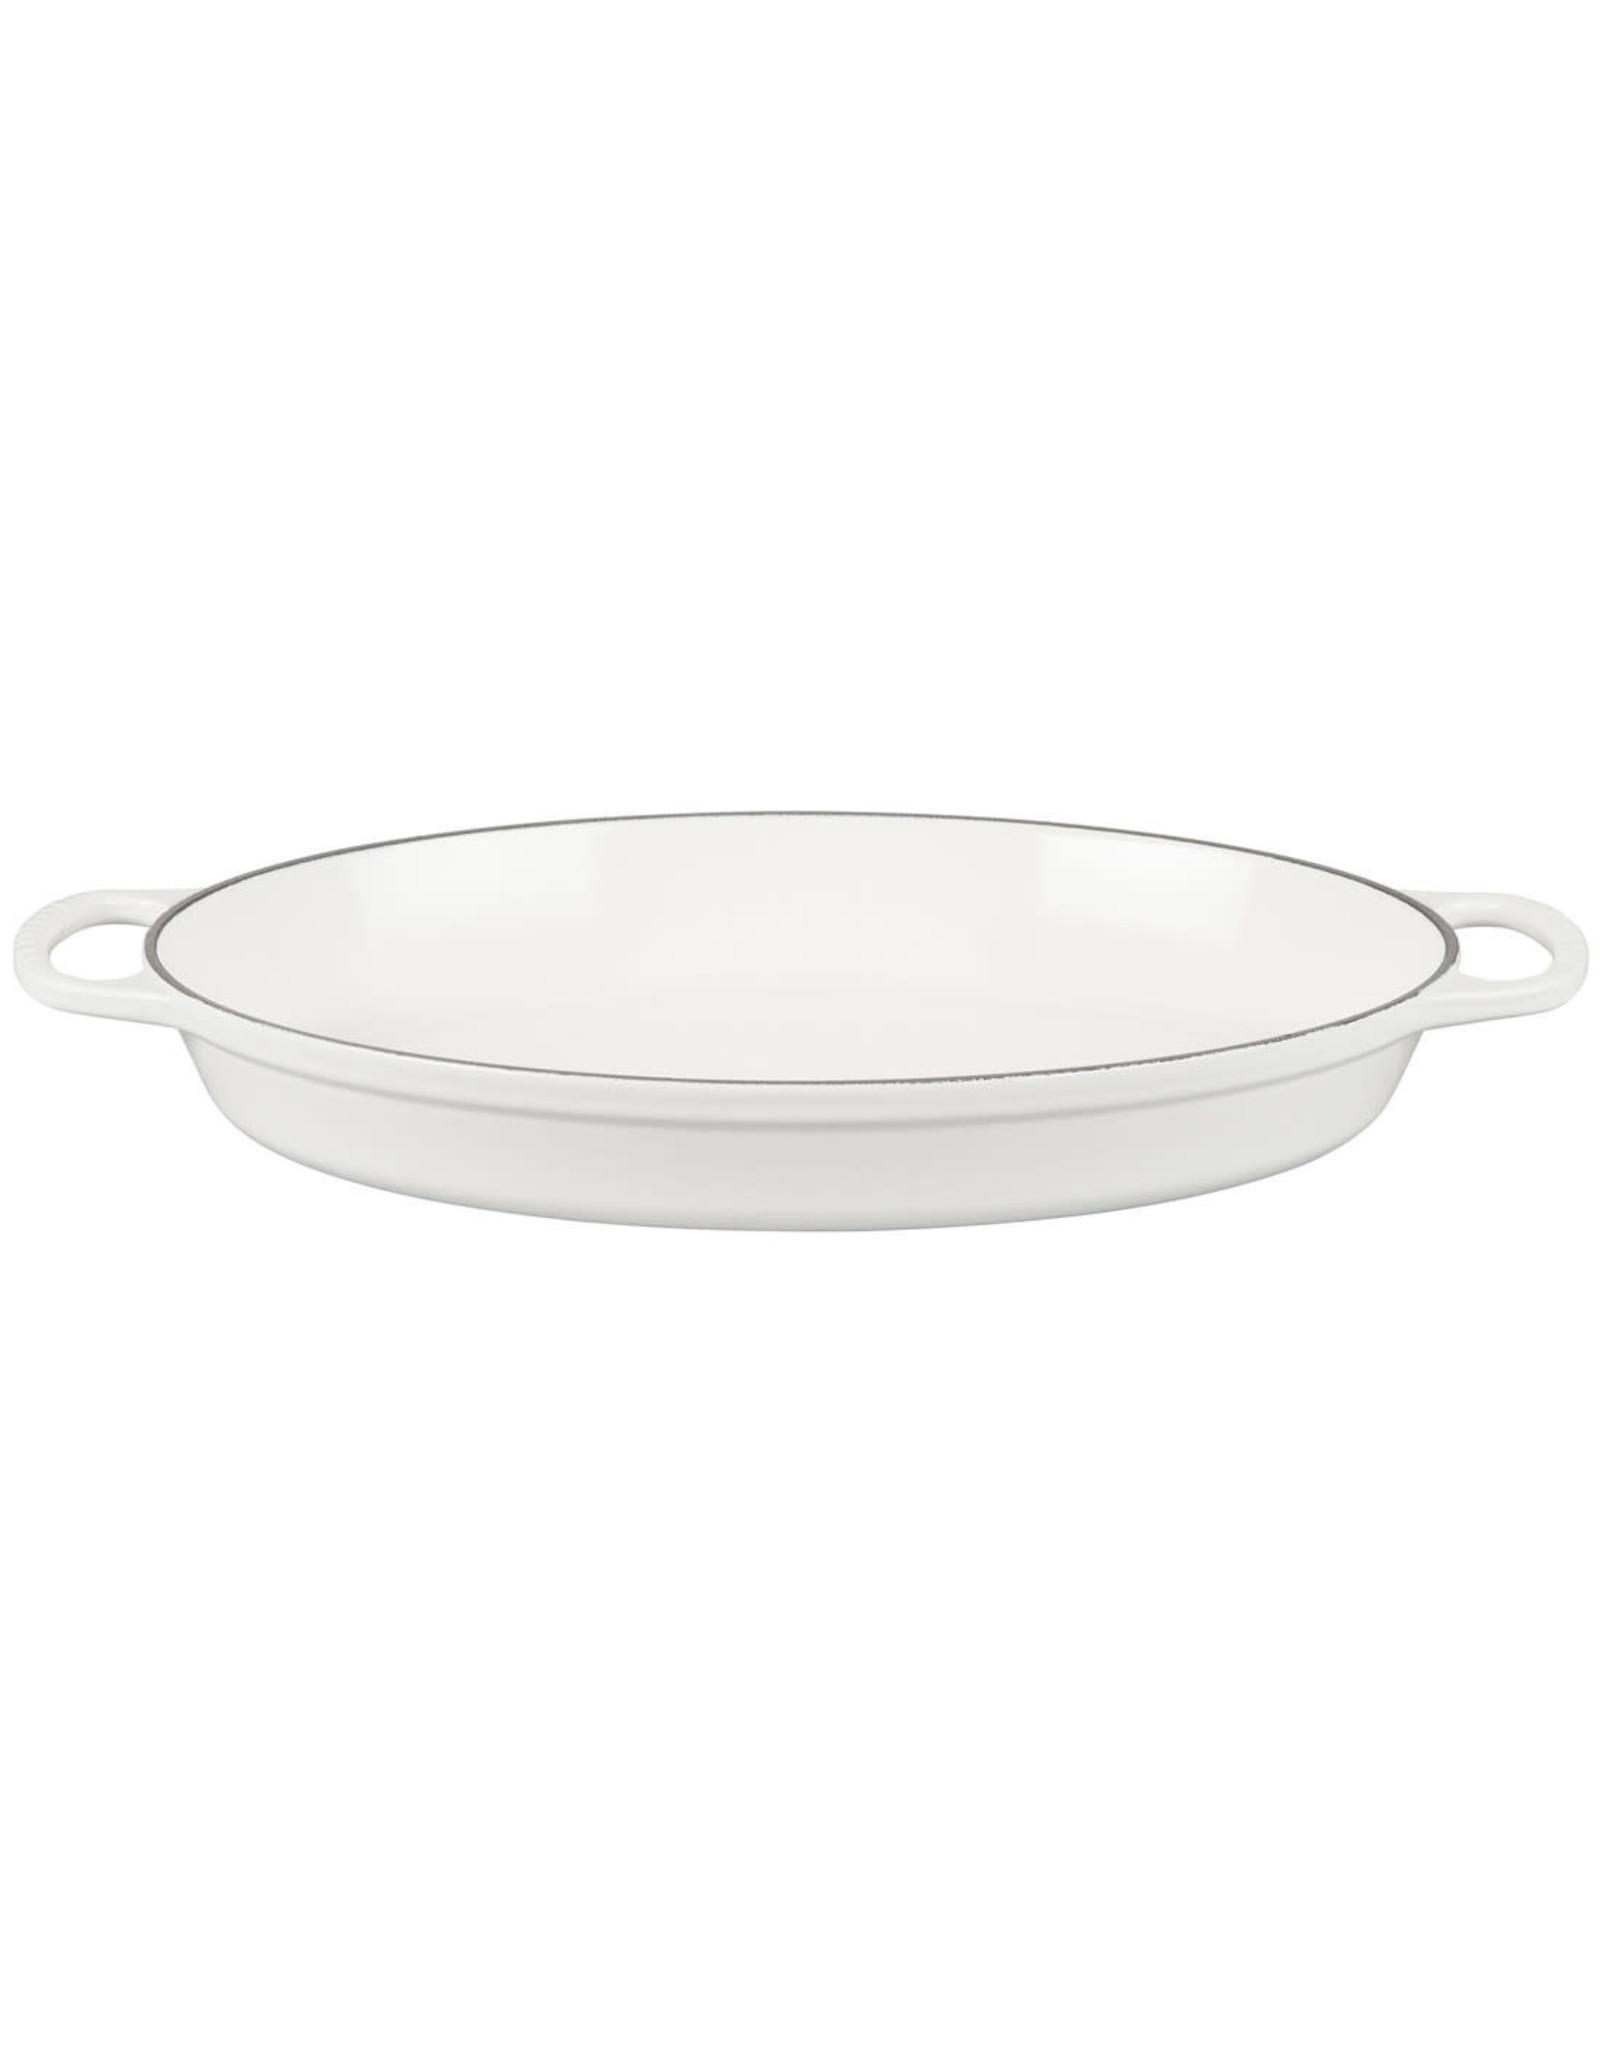 Le Creuset LE CREUSET Signature Oval Baker - White